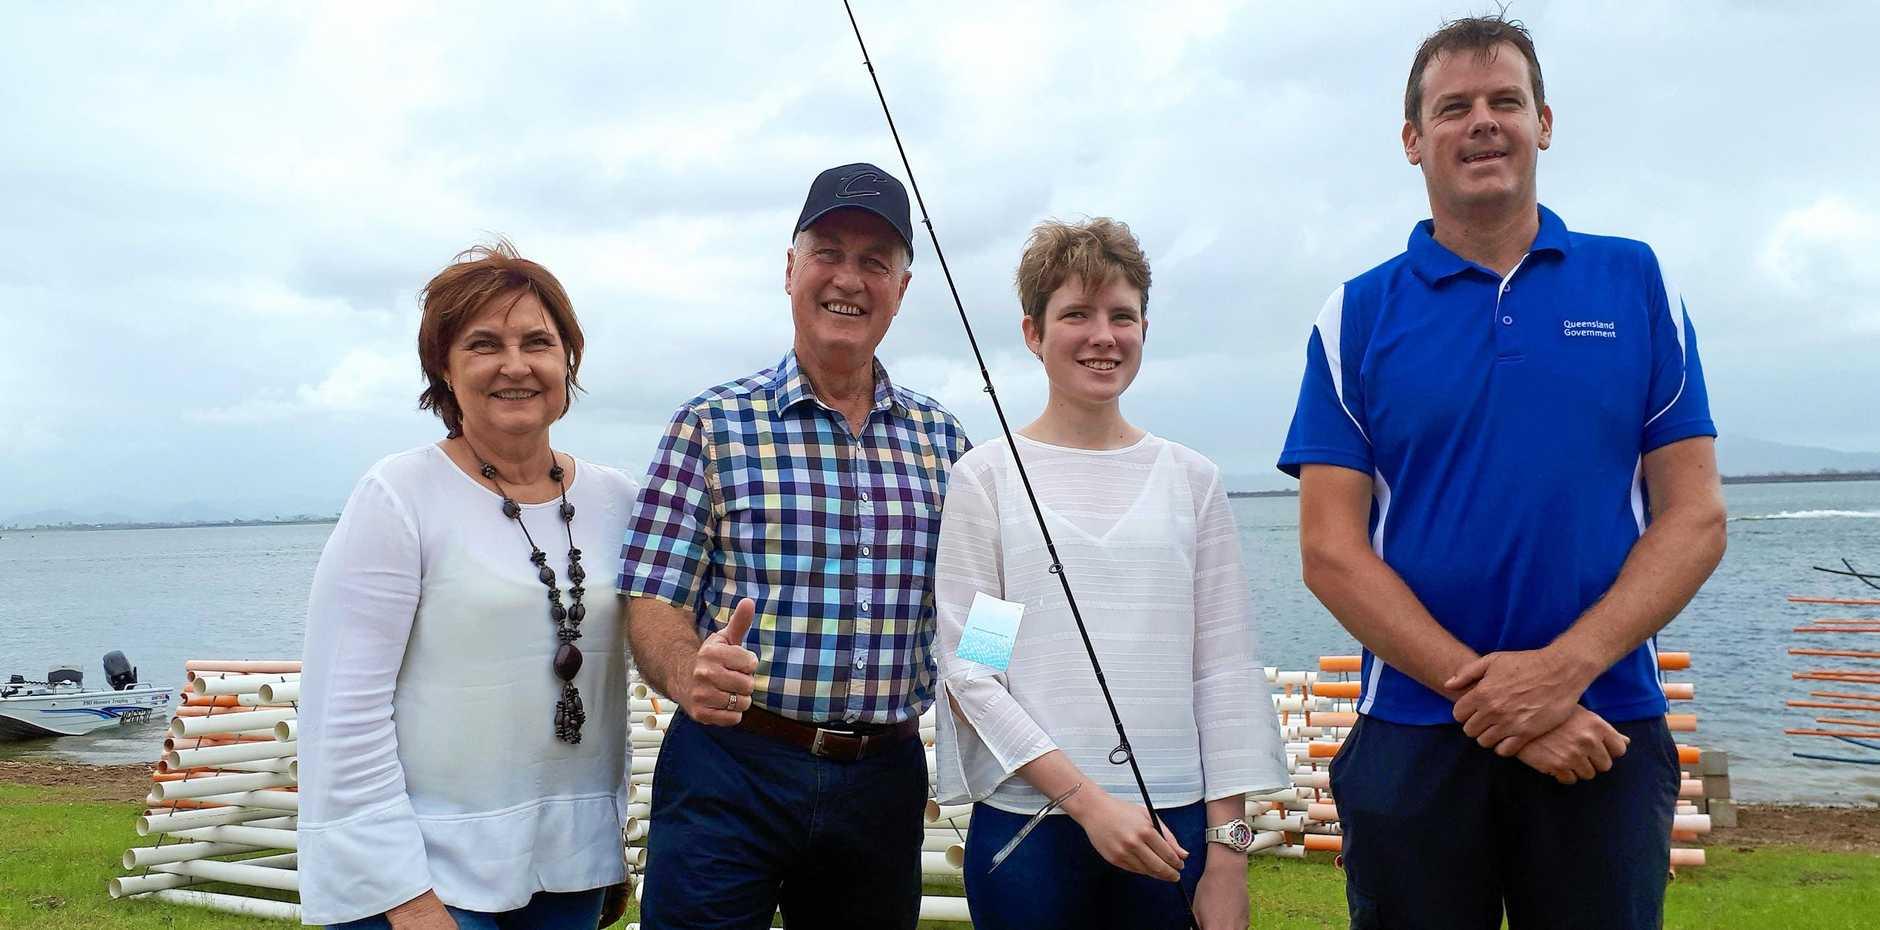 NEW PROJECT: Julianne Gilbert, Greg Williamson, Kirsty Edwards, and David Nixon visited Kinchant Dam on Saturday.